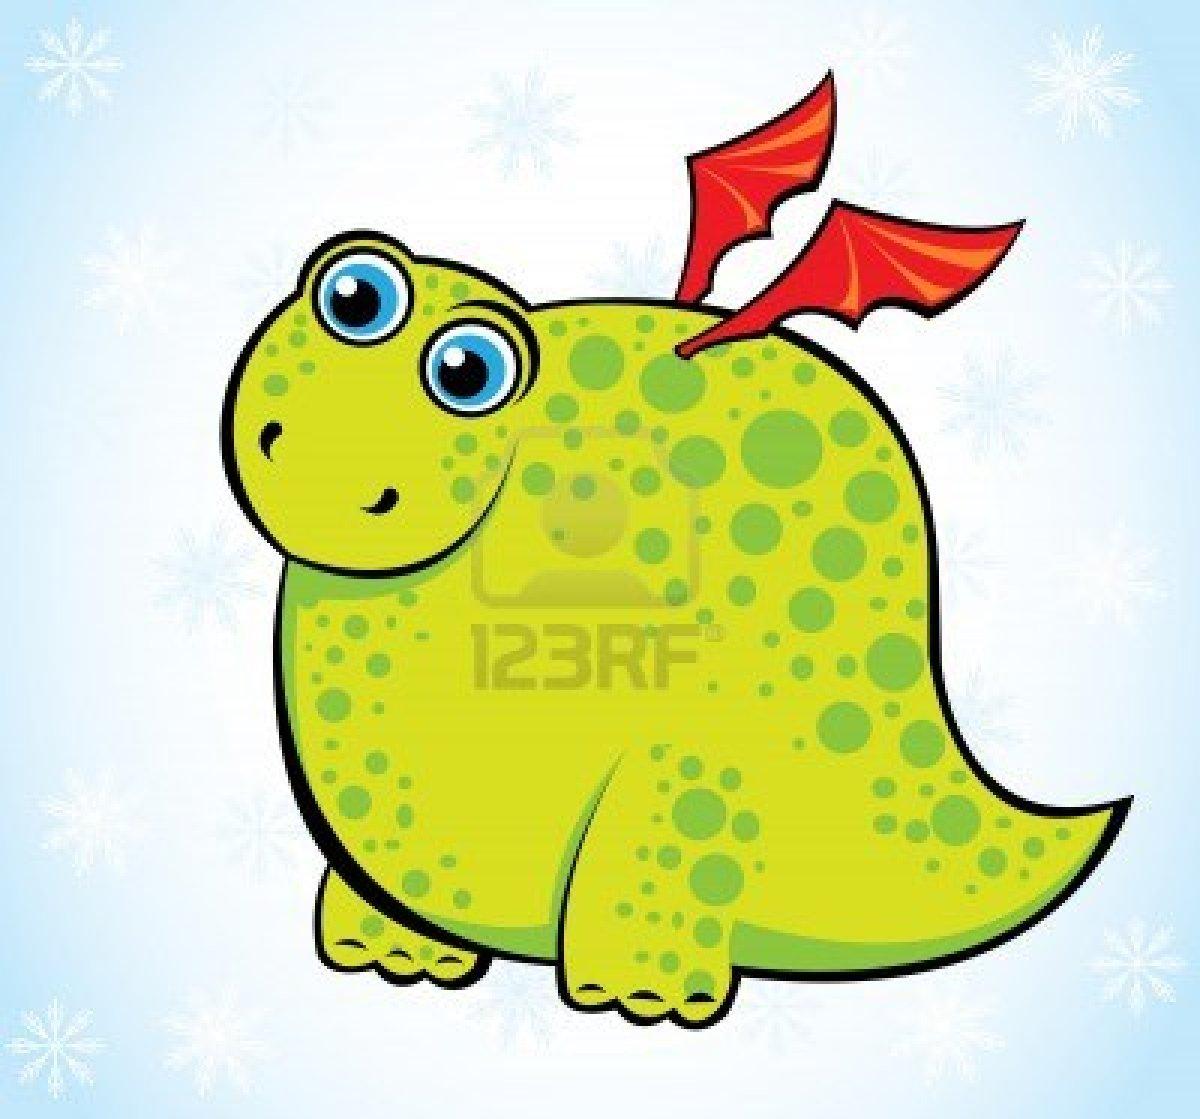 Cartoon Green Funny Dragon On Blue Background 1200x1119 pixel 1200x1119